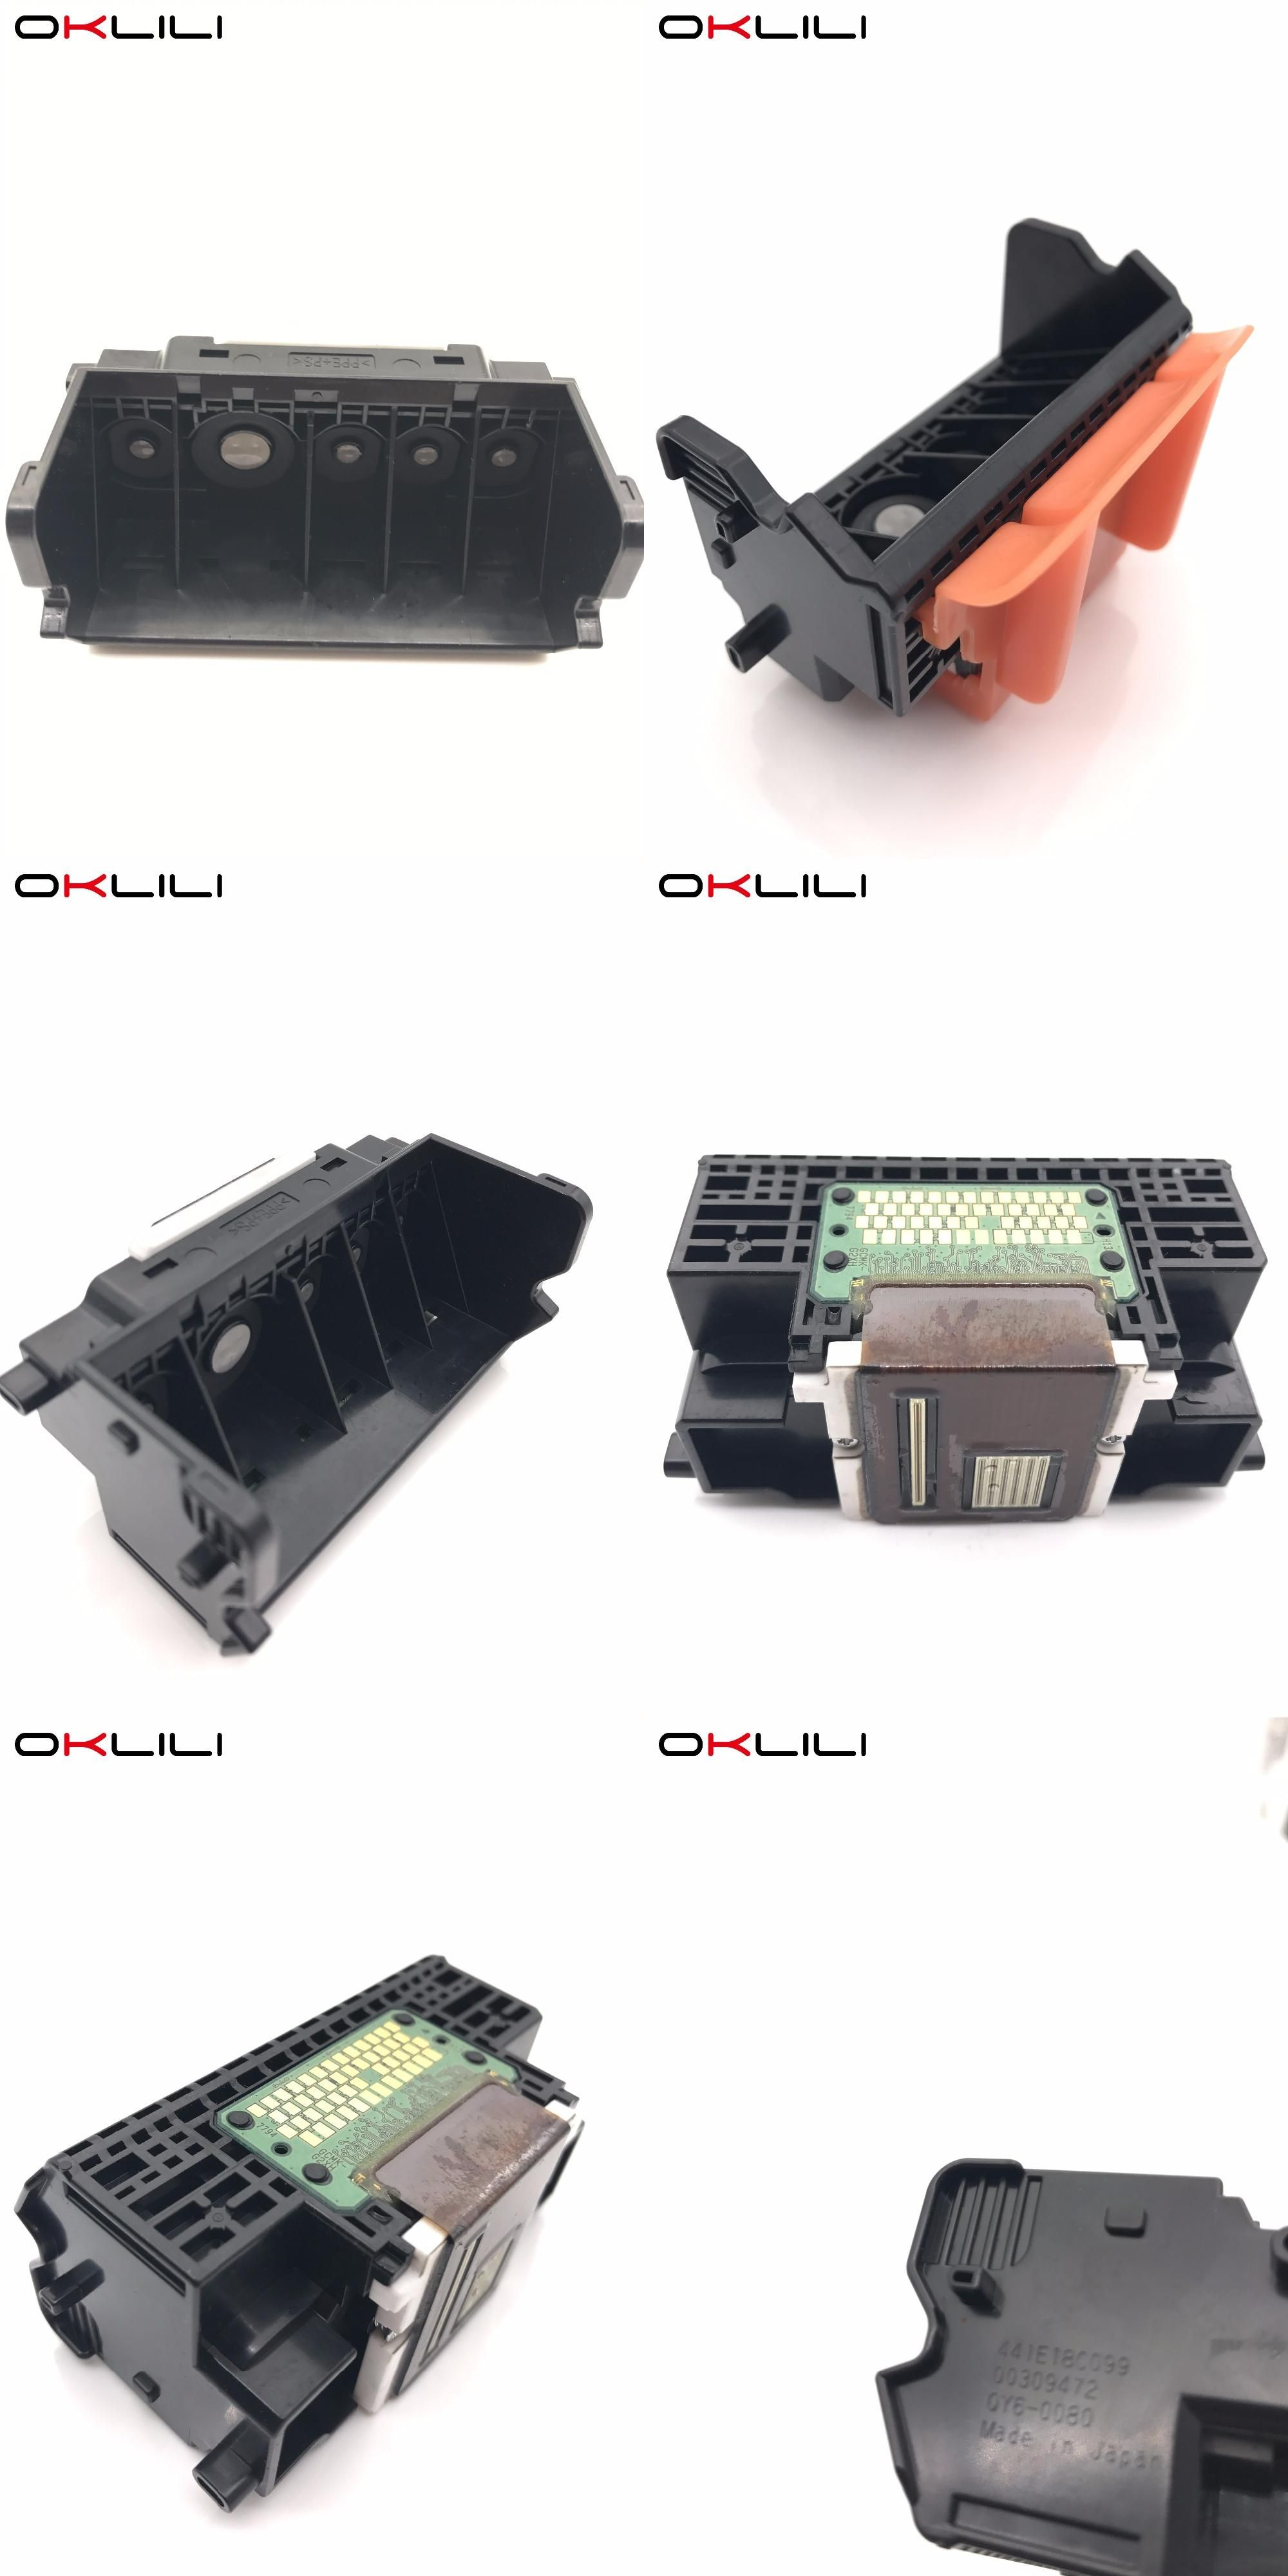 hight resolution of  visit to buy oklili qy6 0080 printhead print head printer for canon ip4820 ip4850 ix6520 ix6550 mx715 mx885 mg5220 mg5250 mg5320 mg5350 advertisement